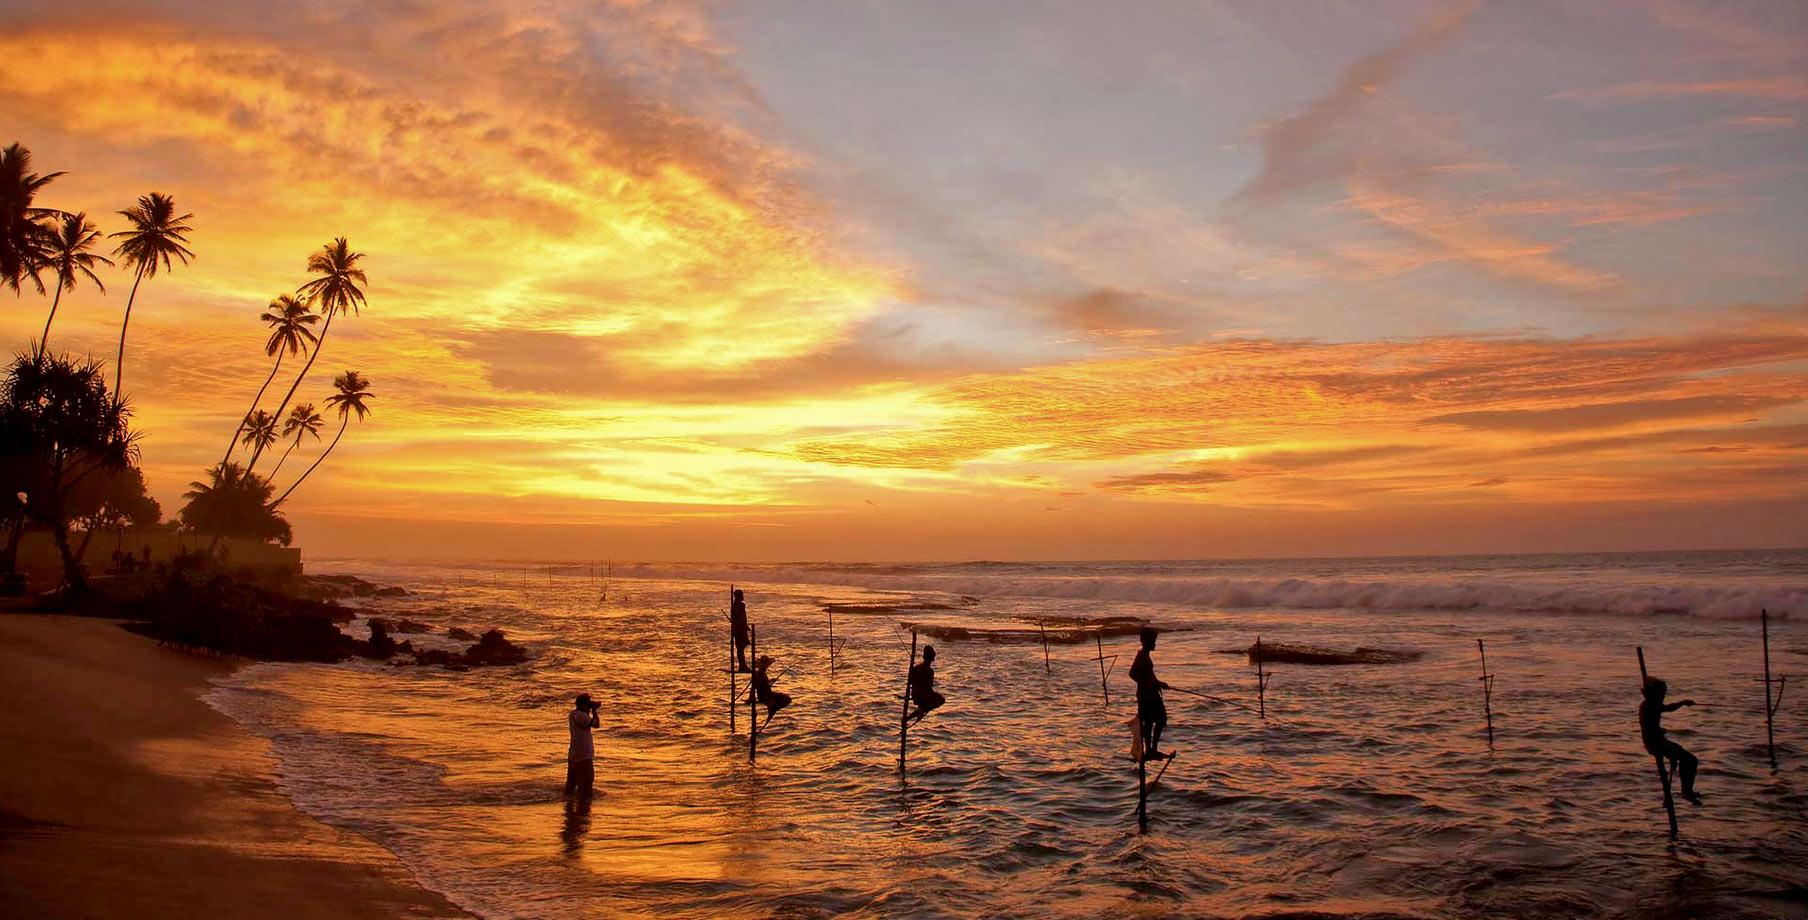 Fishing at sunset via Seal Superyachts Sri Lanka.